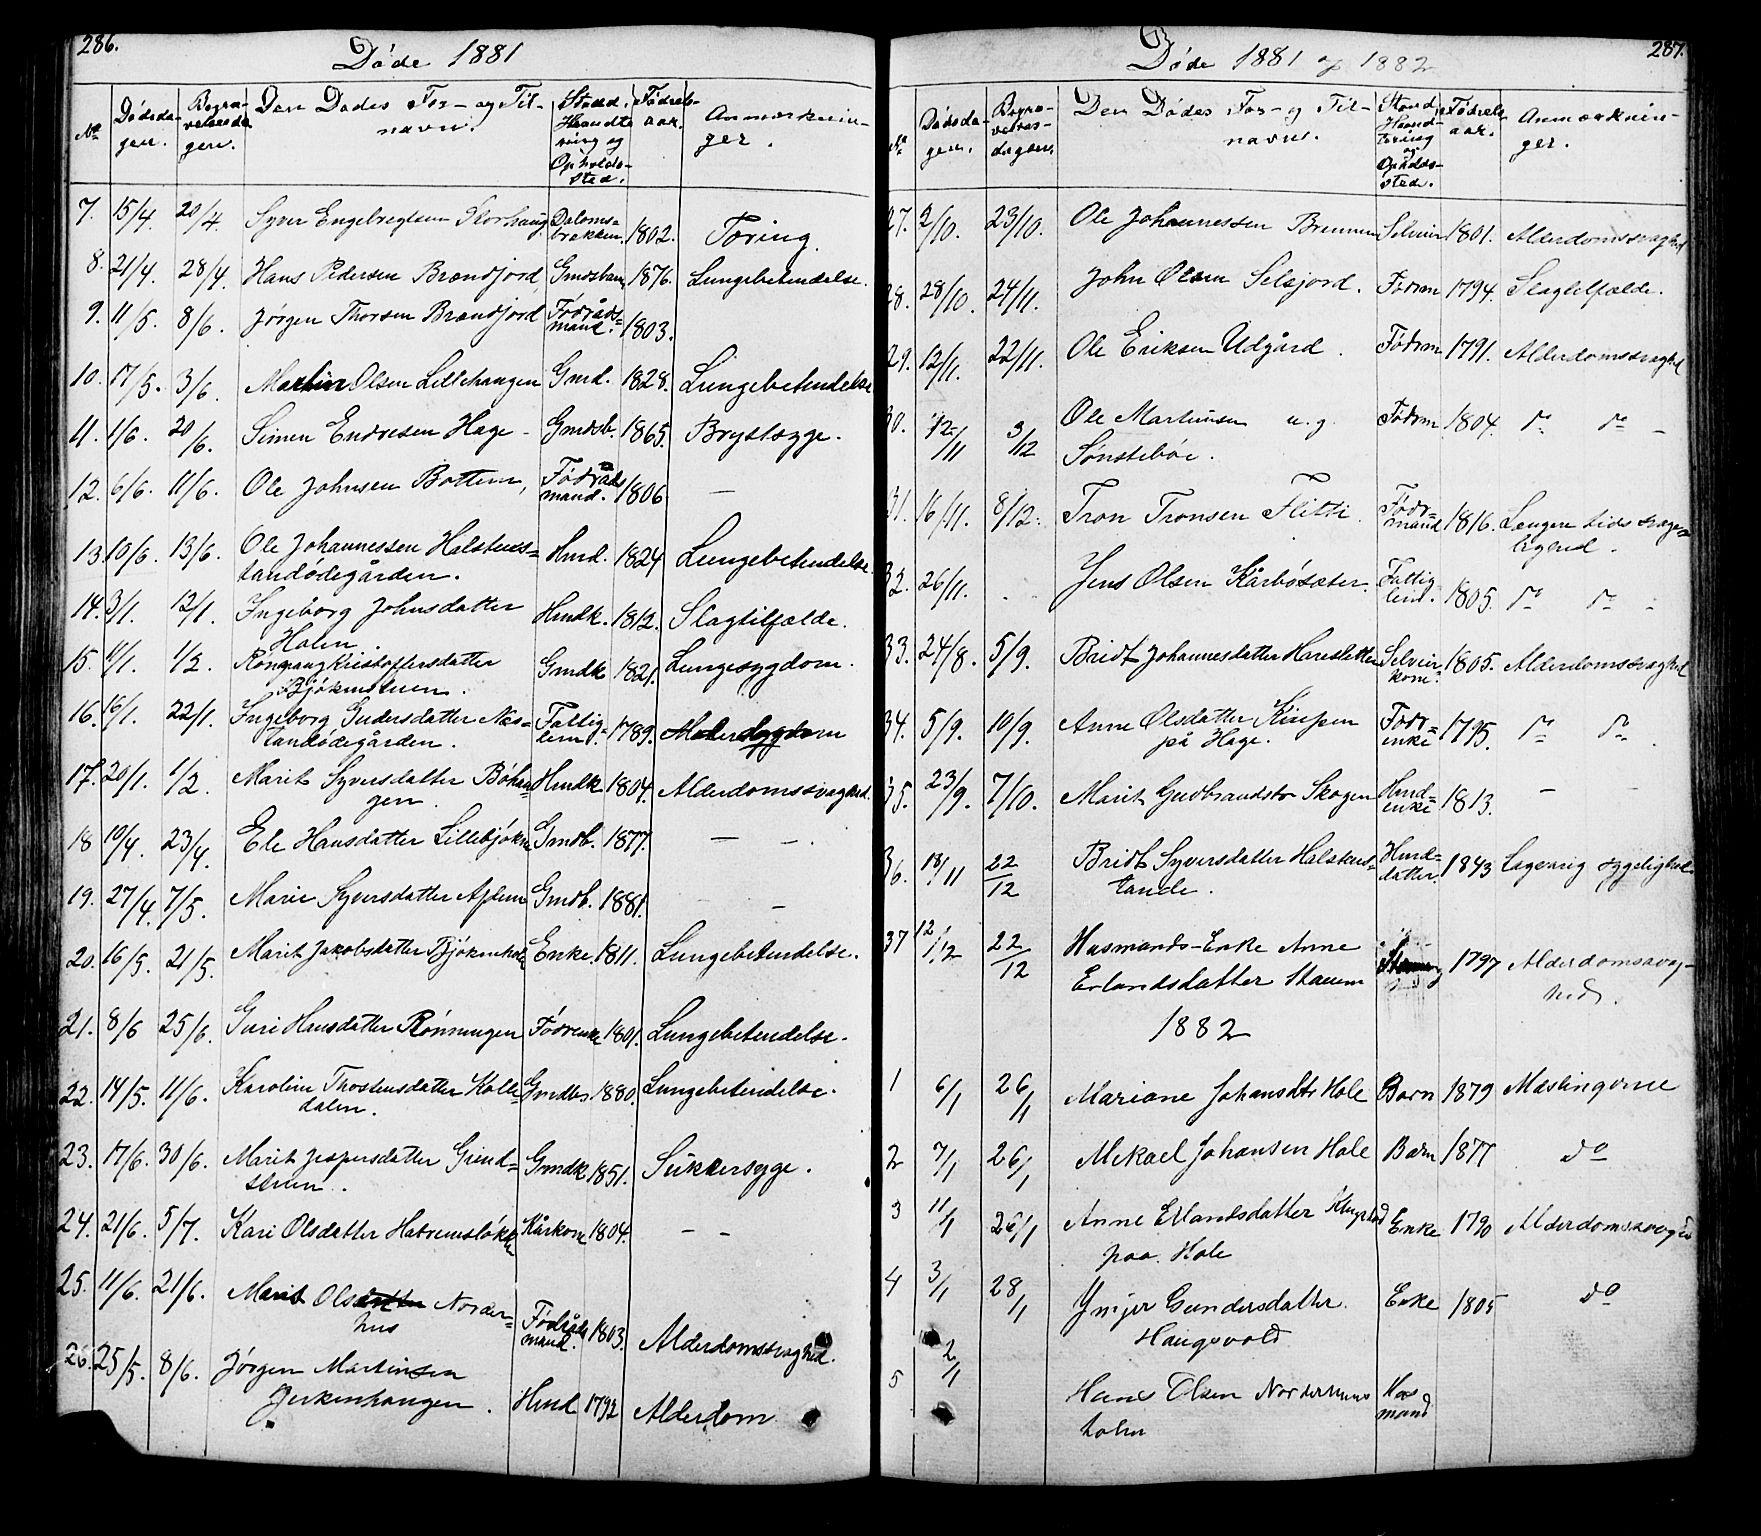 SAH, Lesja prestekontor, Klokkerbok nr. 5, 1850-1894, s. 286-287